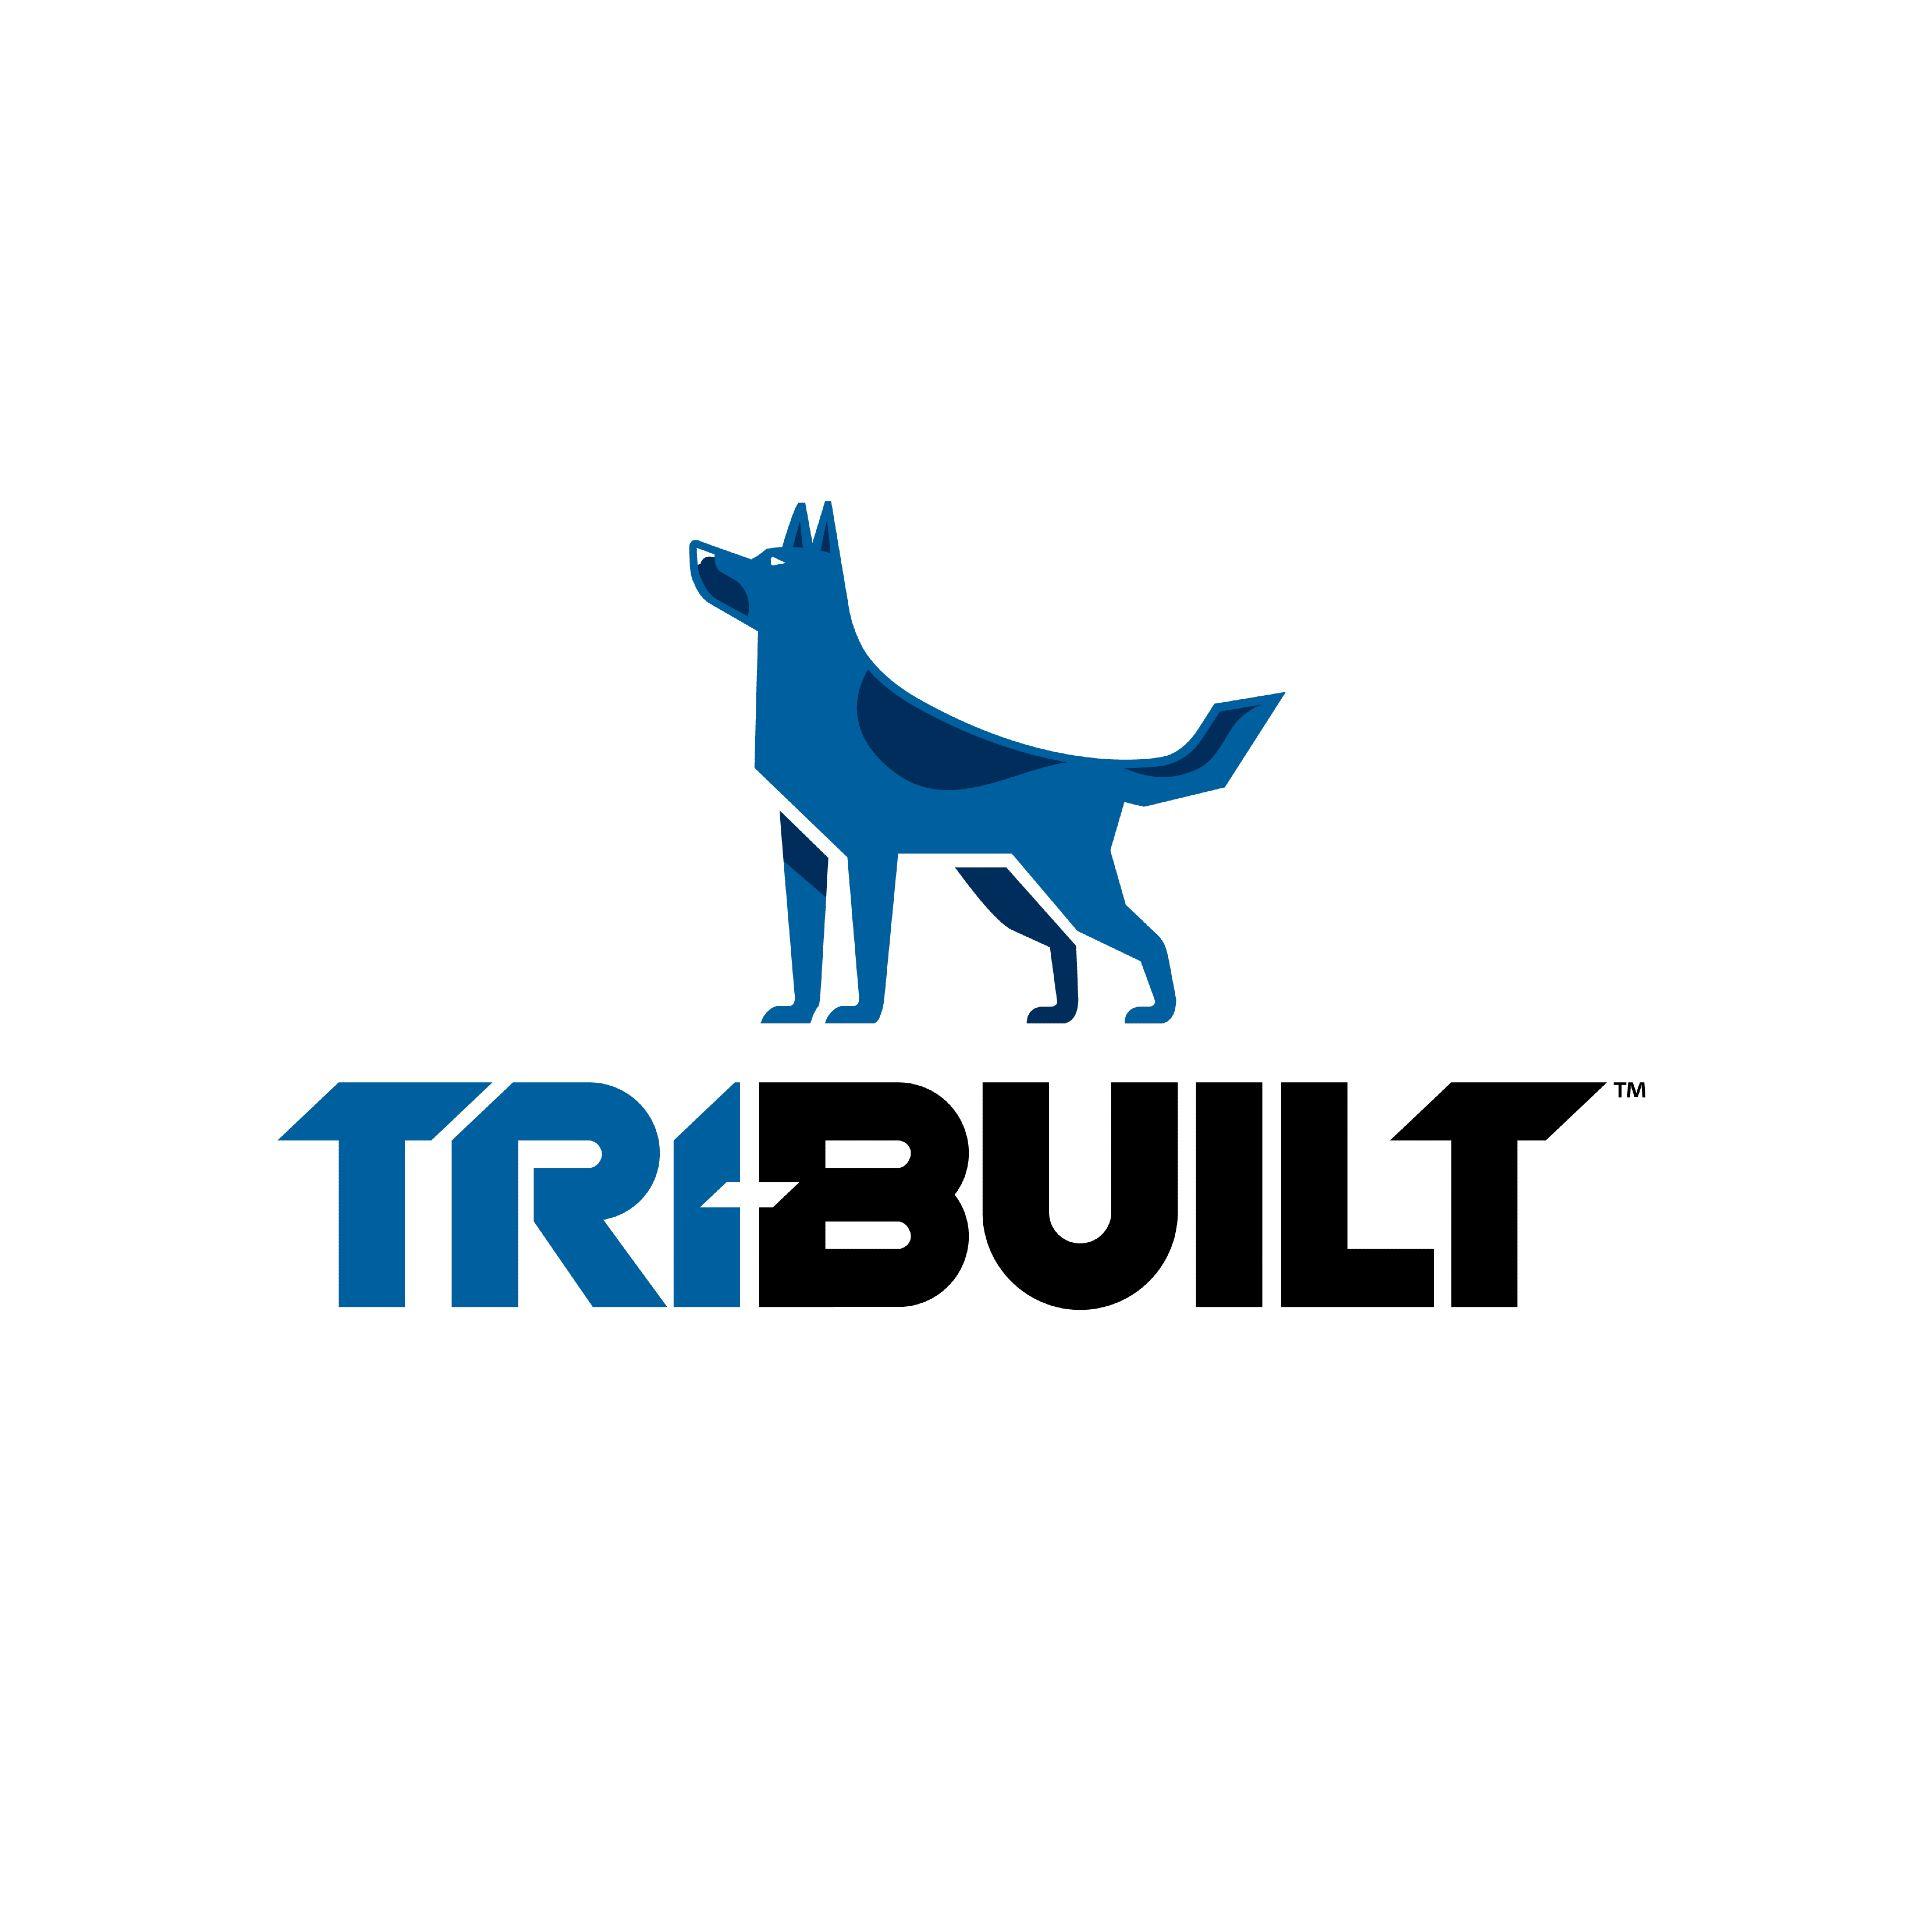 "TRI-BUILT 1/2"" x 4' x 8' StructoDek Red Primed"